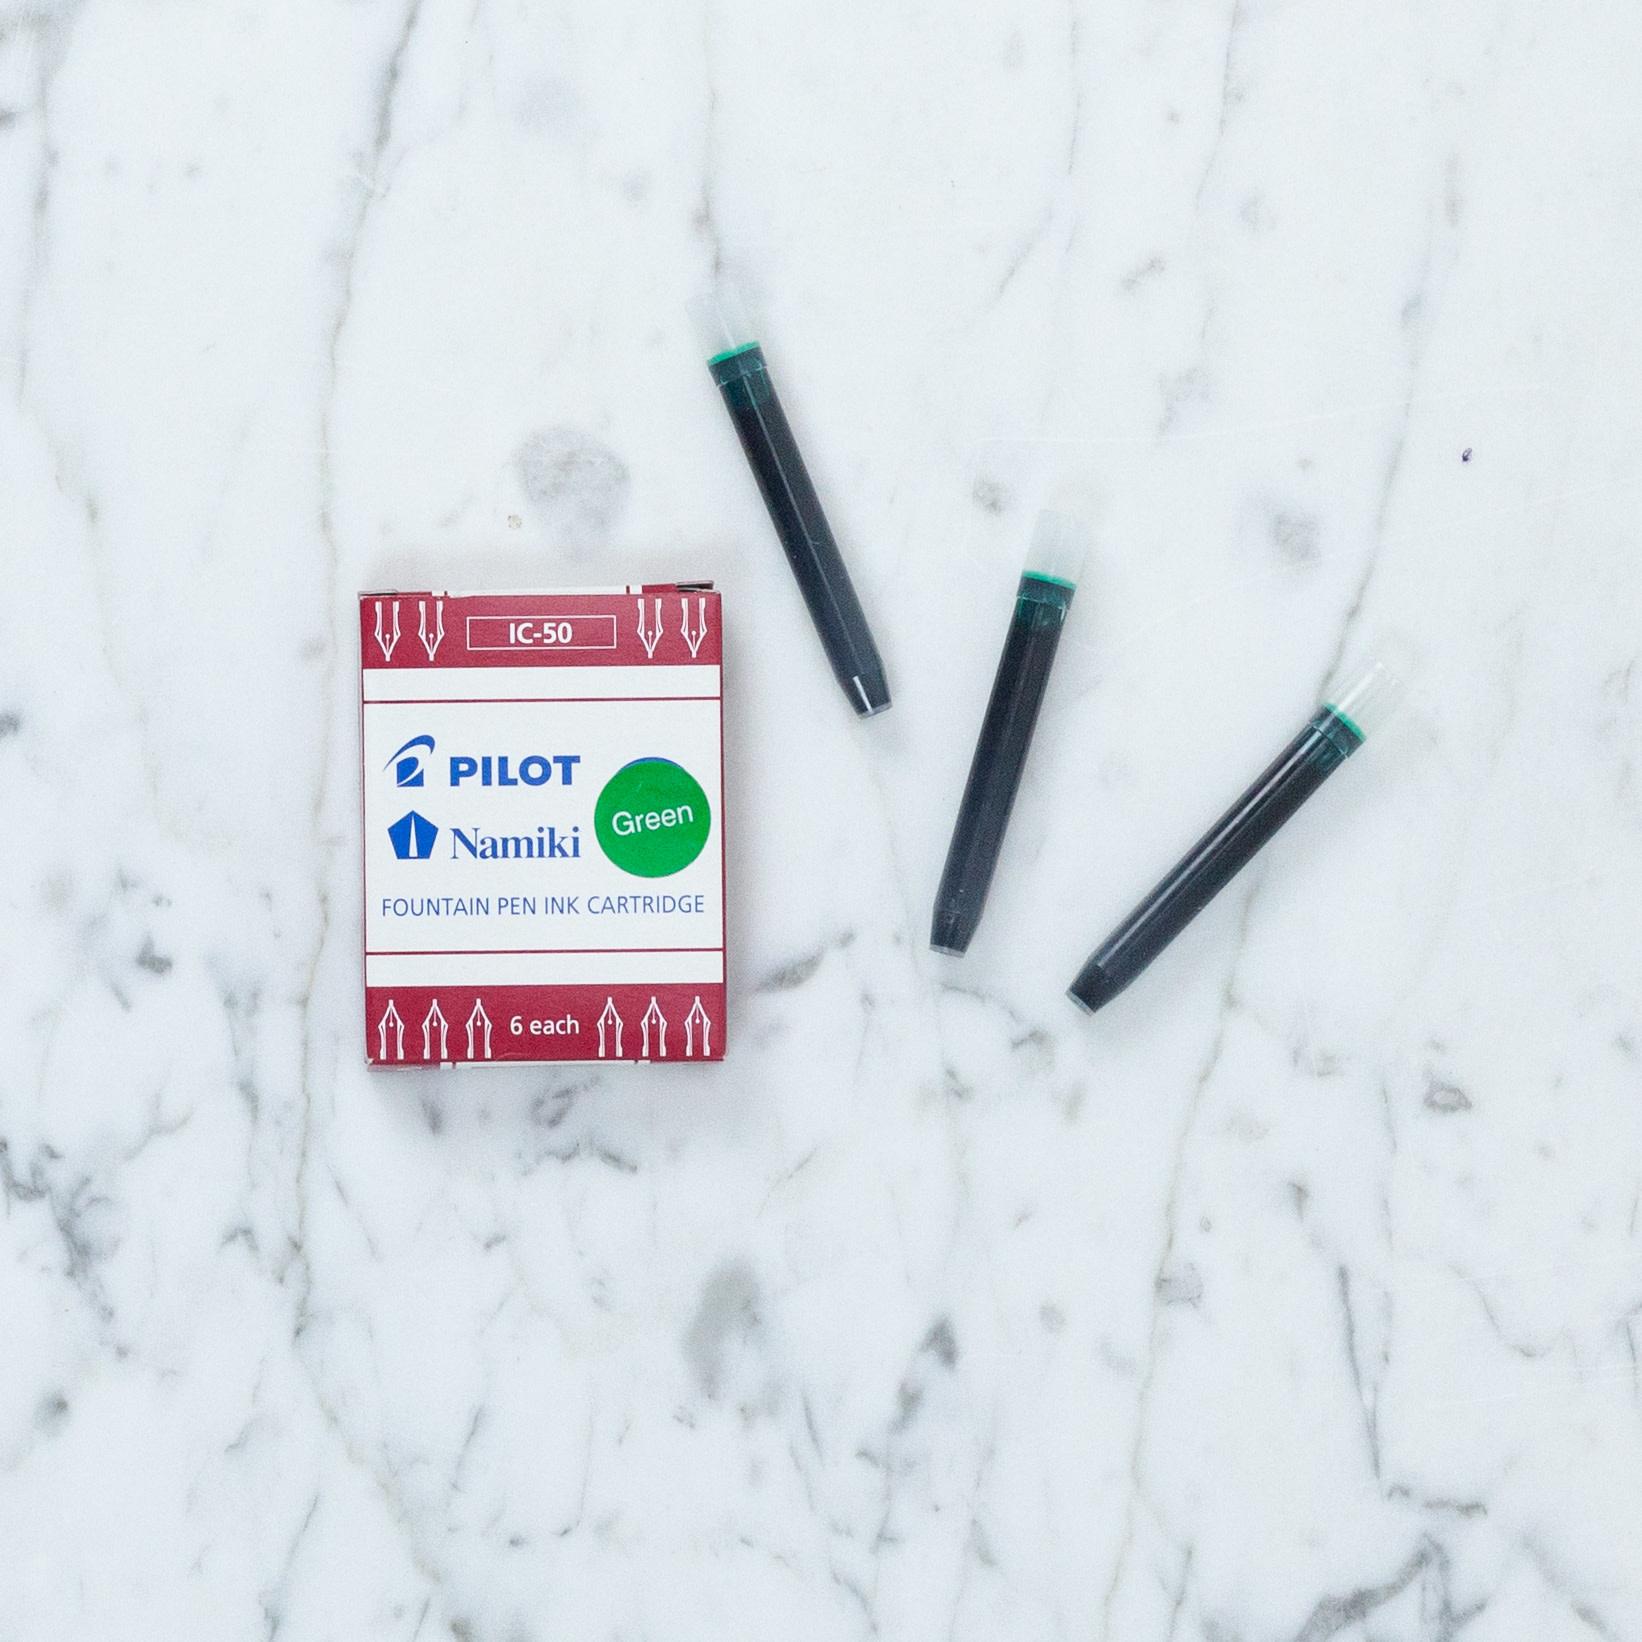 Pilot Namiki Fountain Pen Refill Pack - IC50 Green